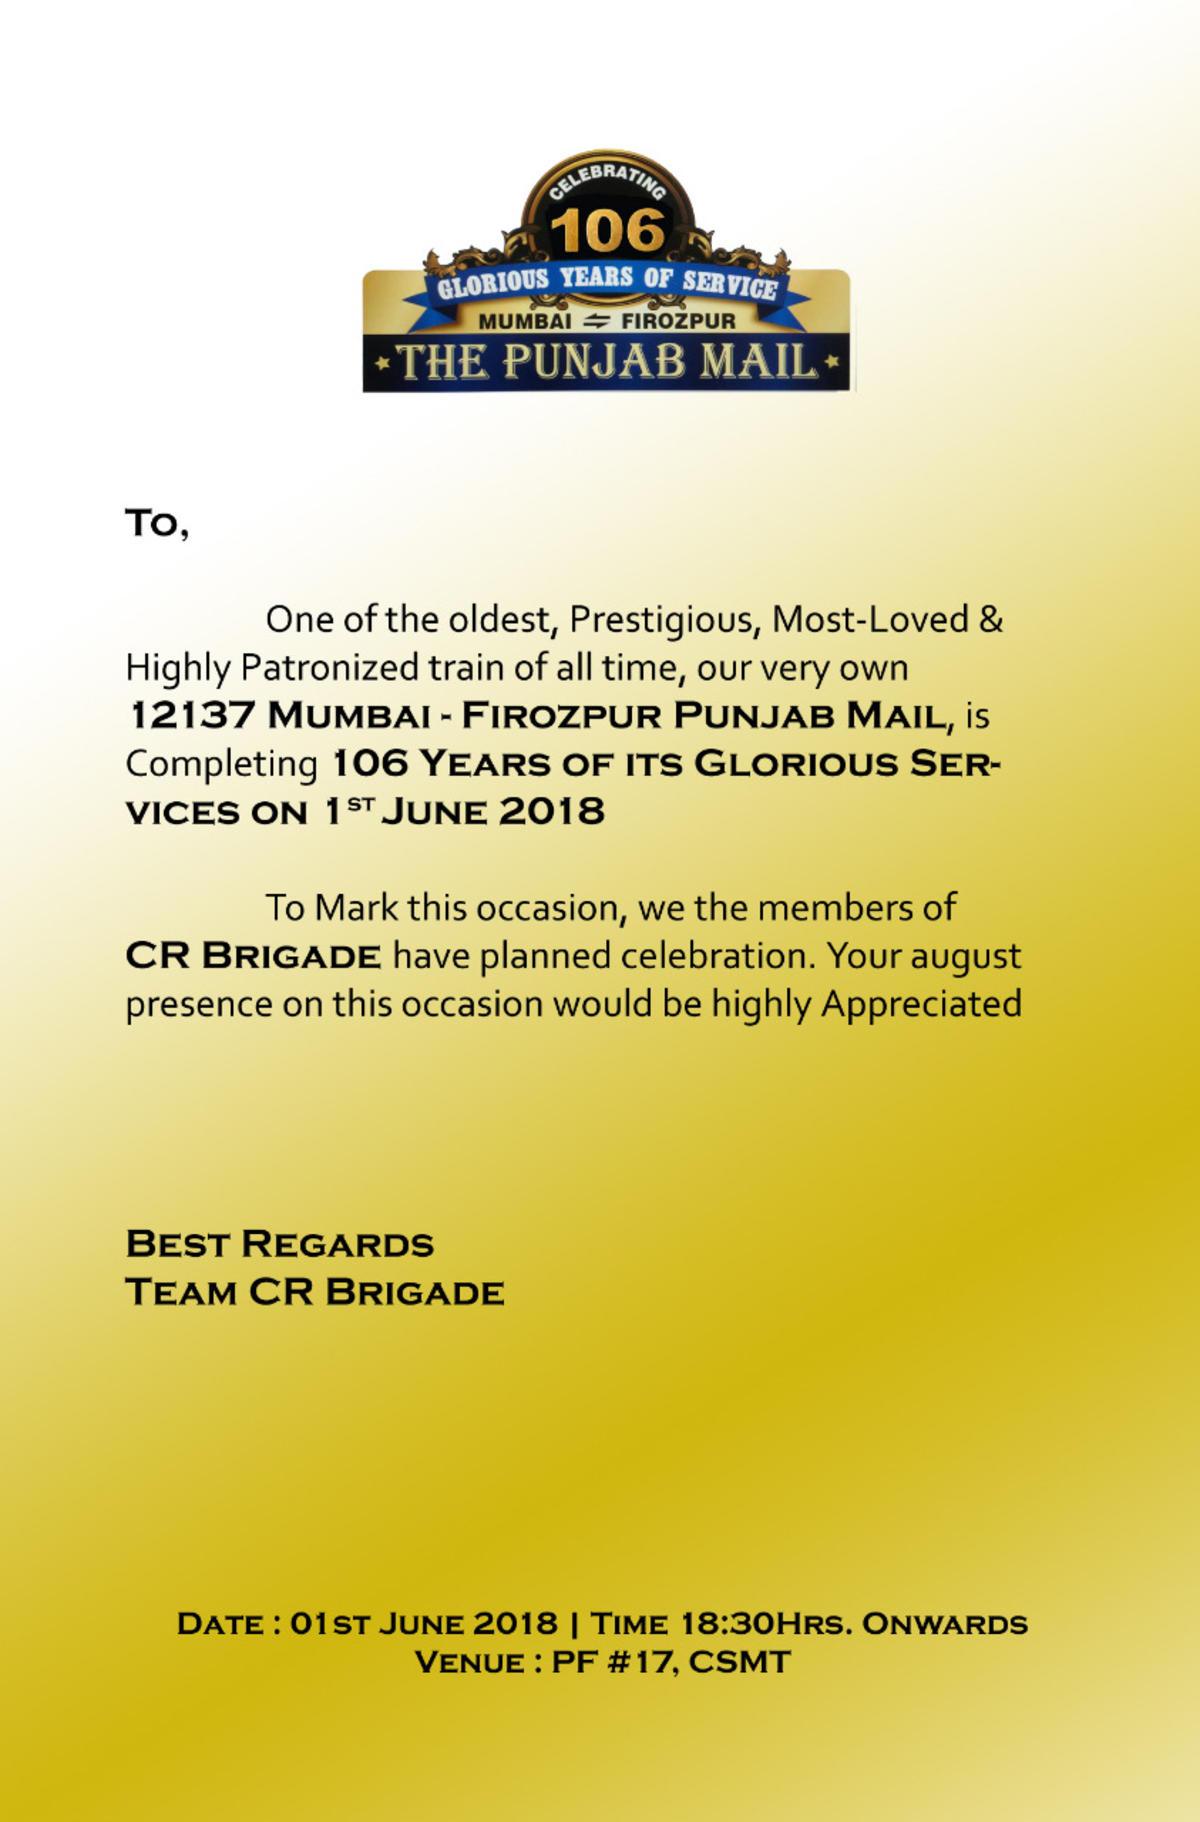 3474483-0: Happy Birthday to the Legendary Punjab M 12137